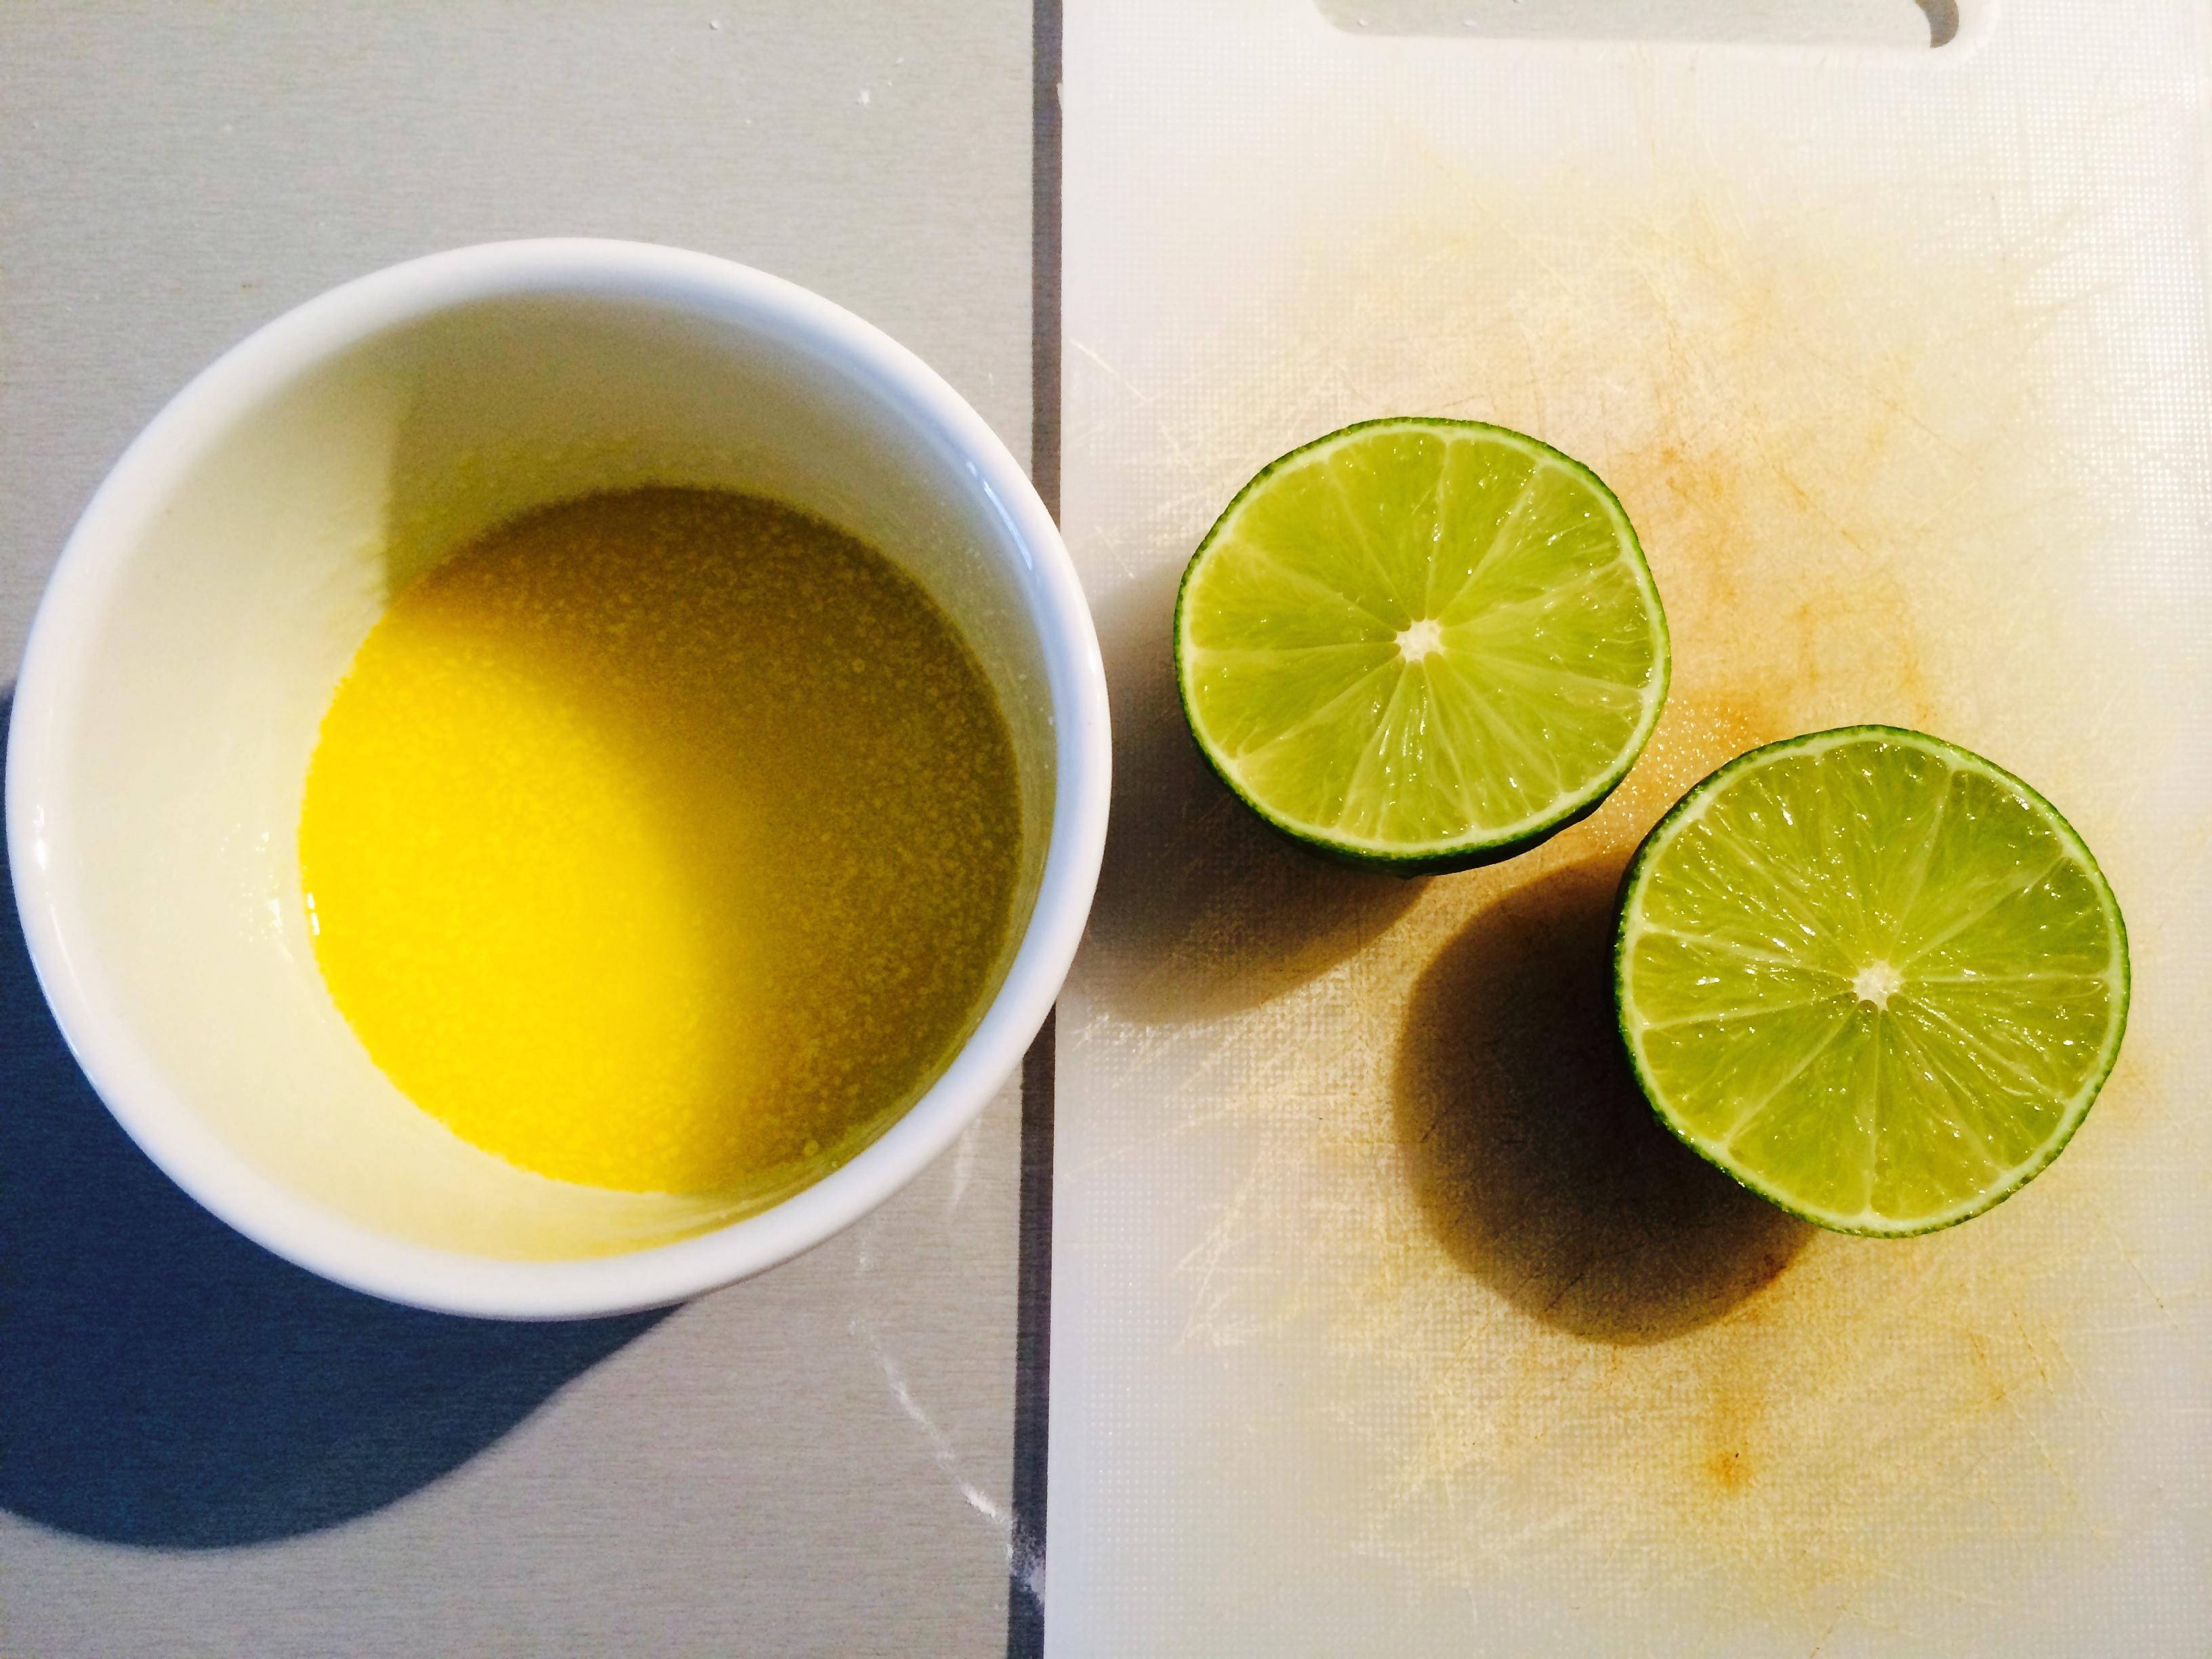 sauce beurre citron micro onde. Black Bedroom Furniture Sets. Home Design Ideas